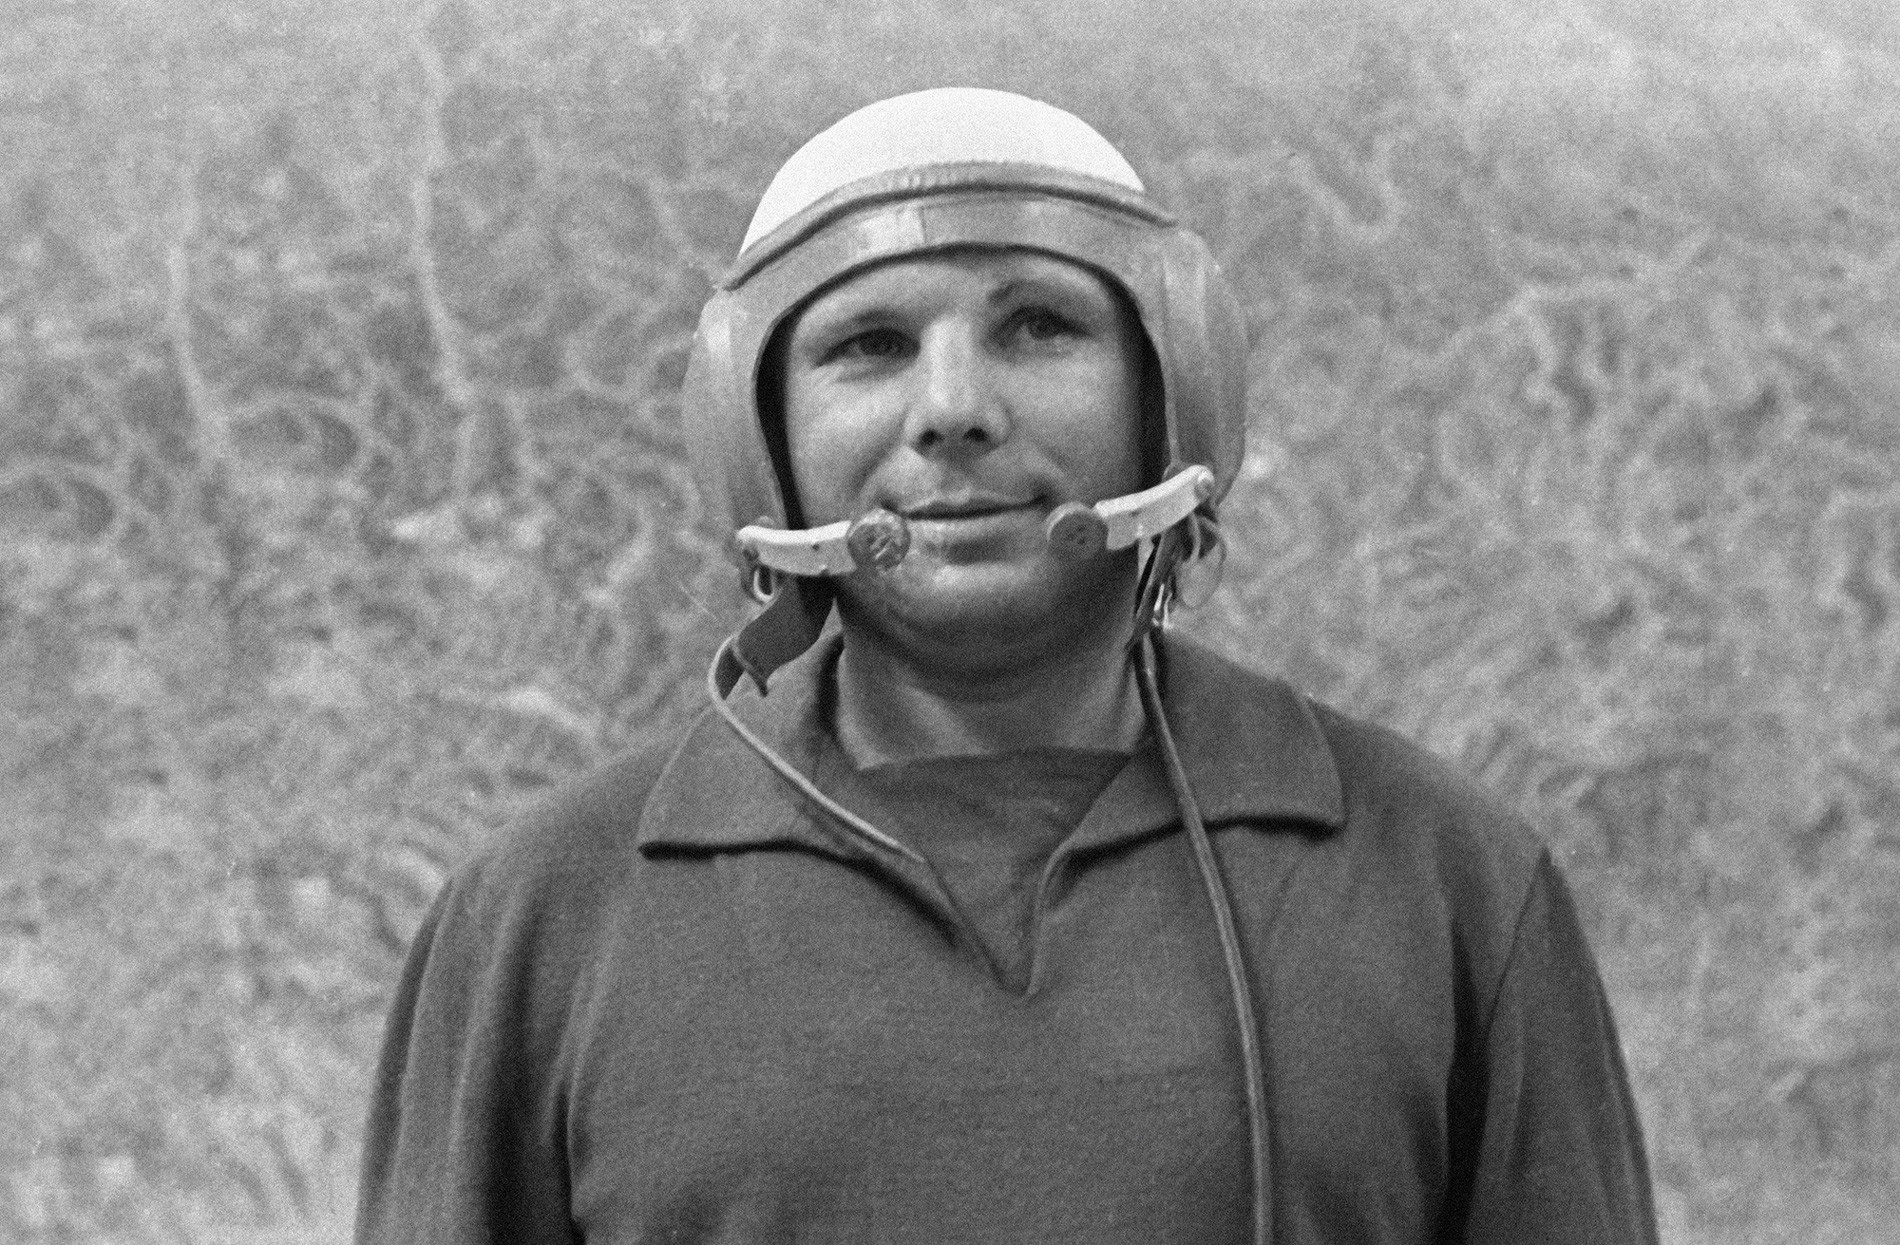 Pilot i kozmonaut Jurij Gagarin, 1. lipnja 1962.